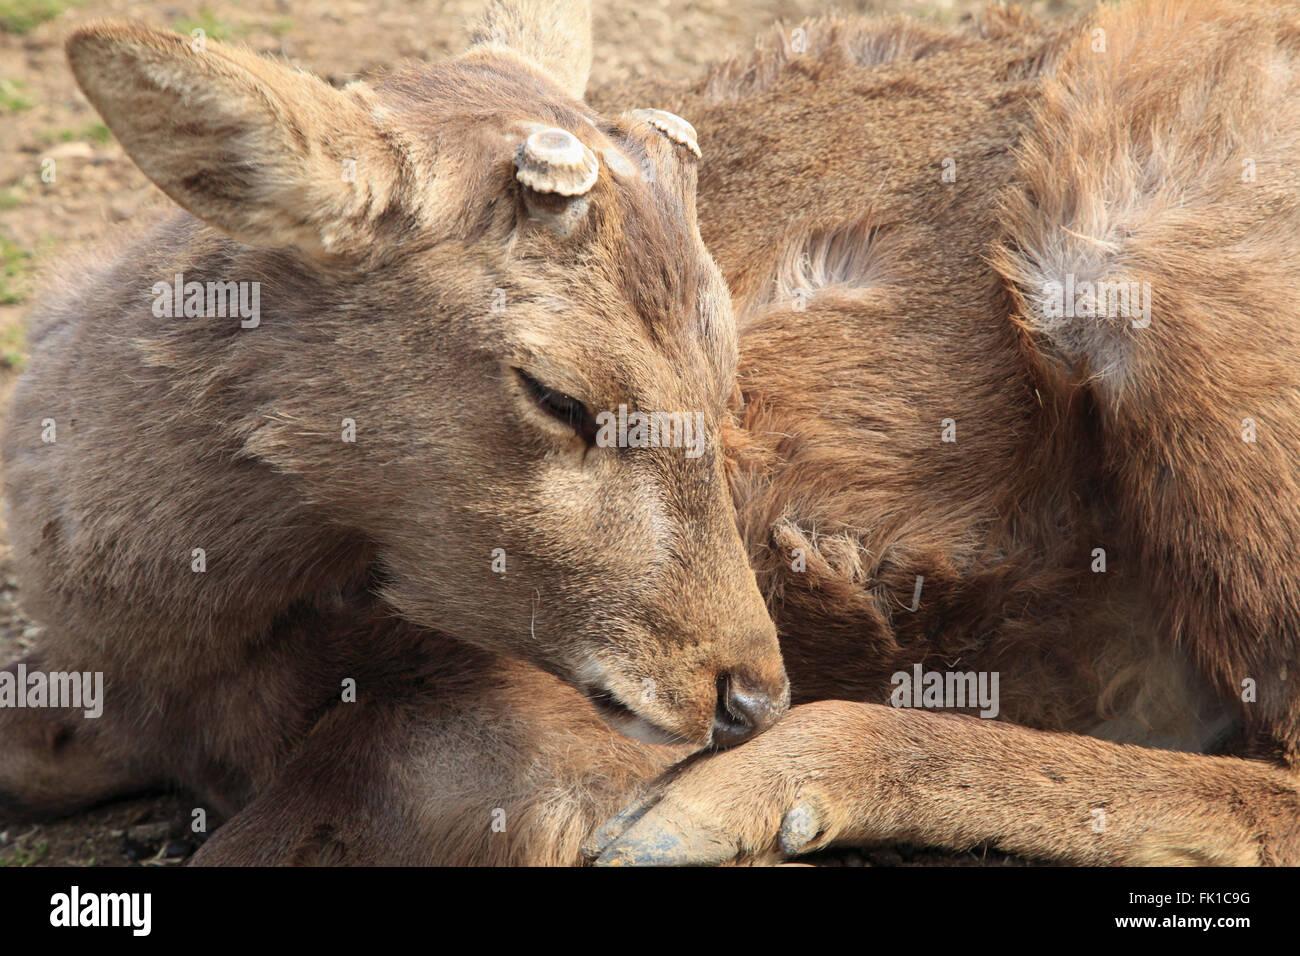 Japan, Nara, Hirsch, Stockbild